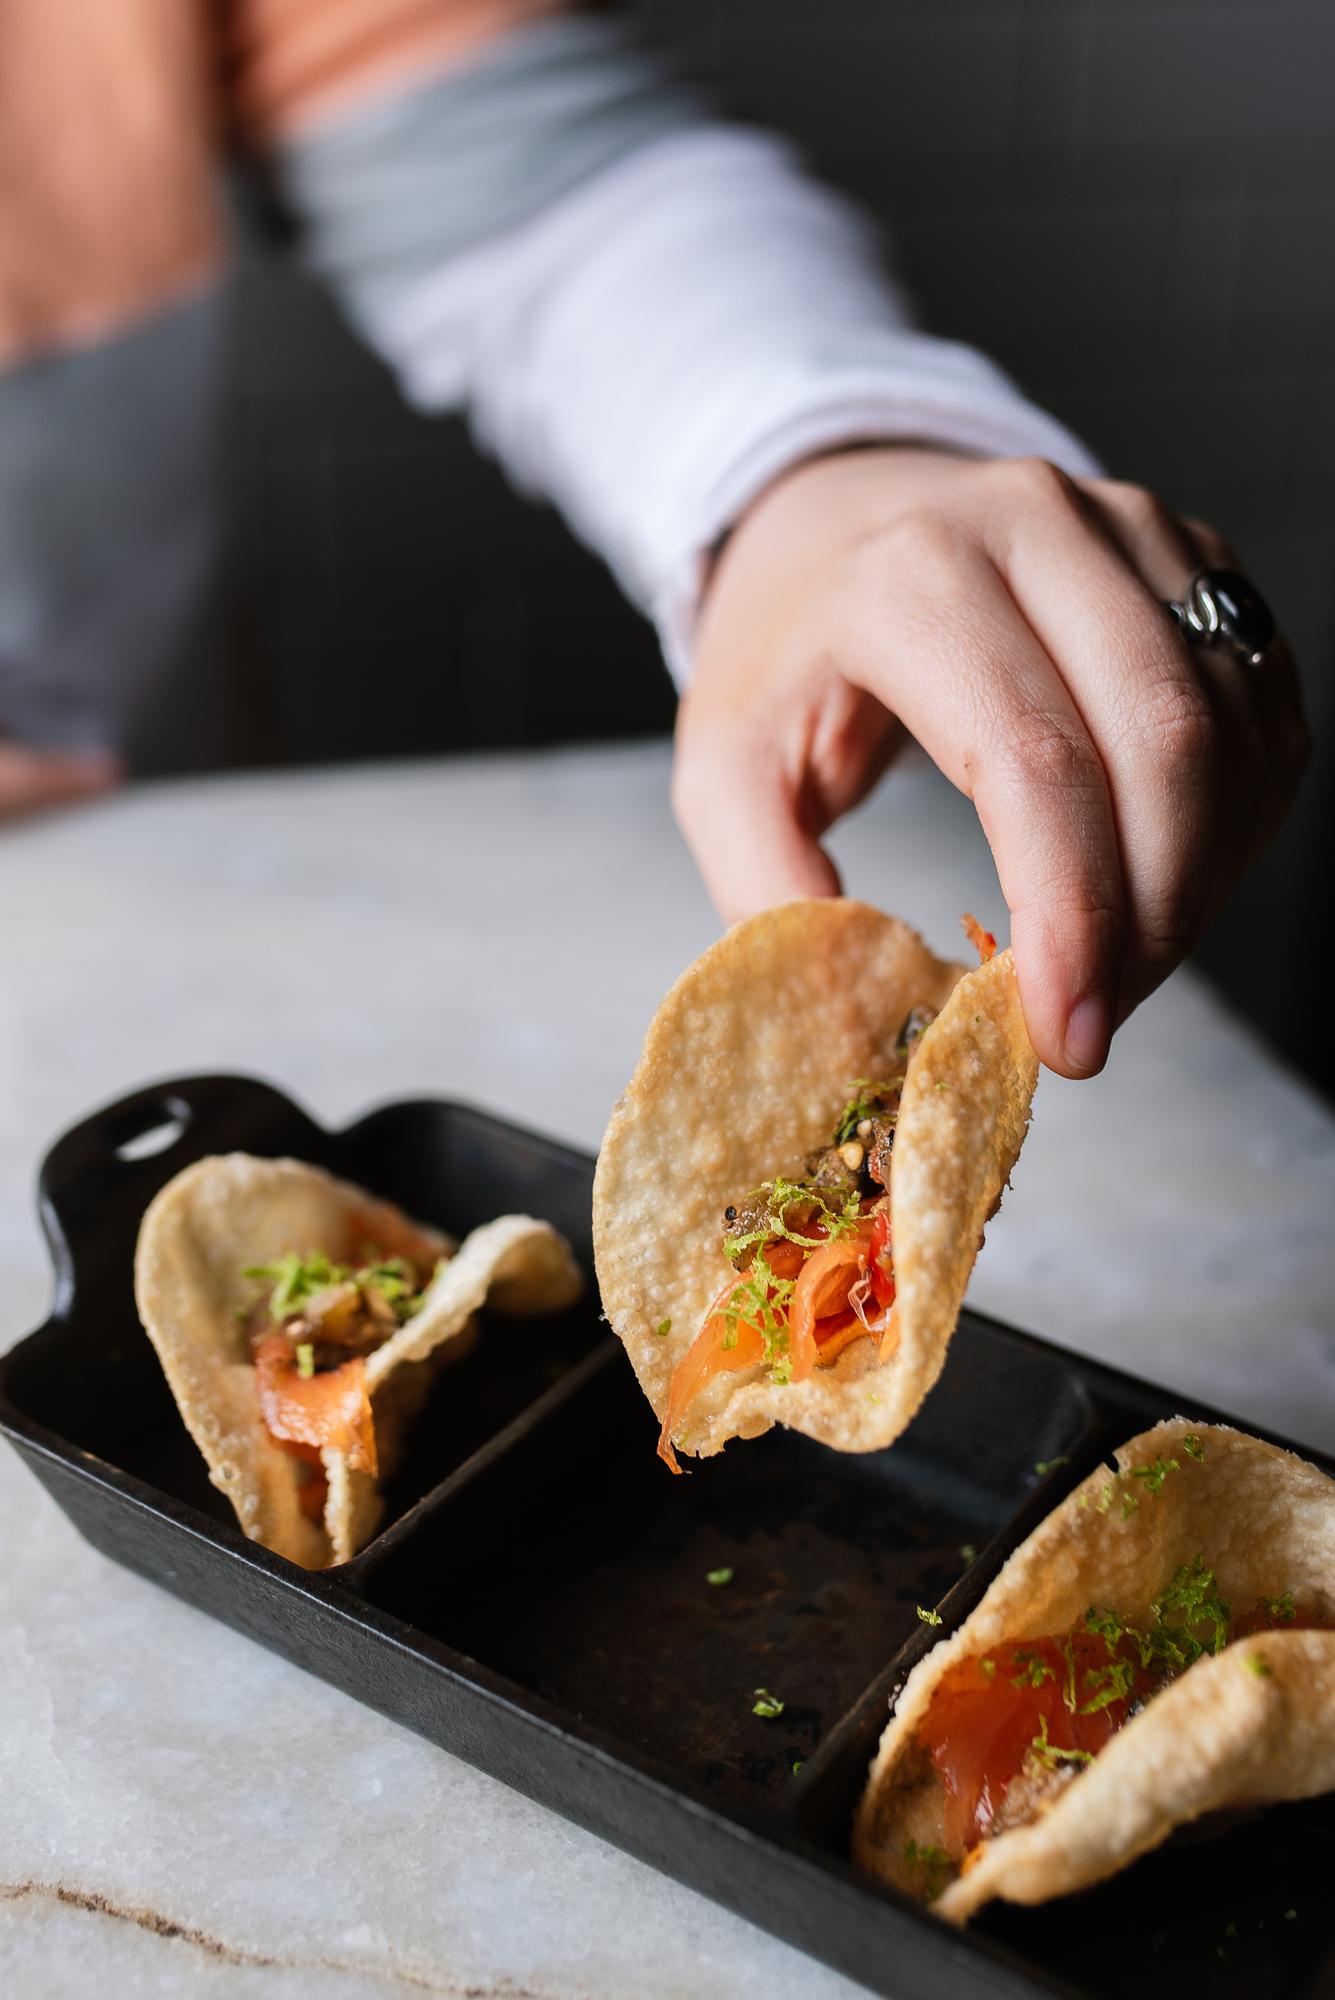 Wonton Tacos - Citrus cured salmon, charred tomatillo relish